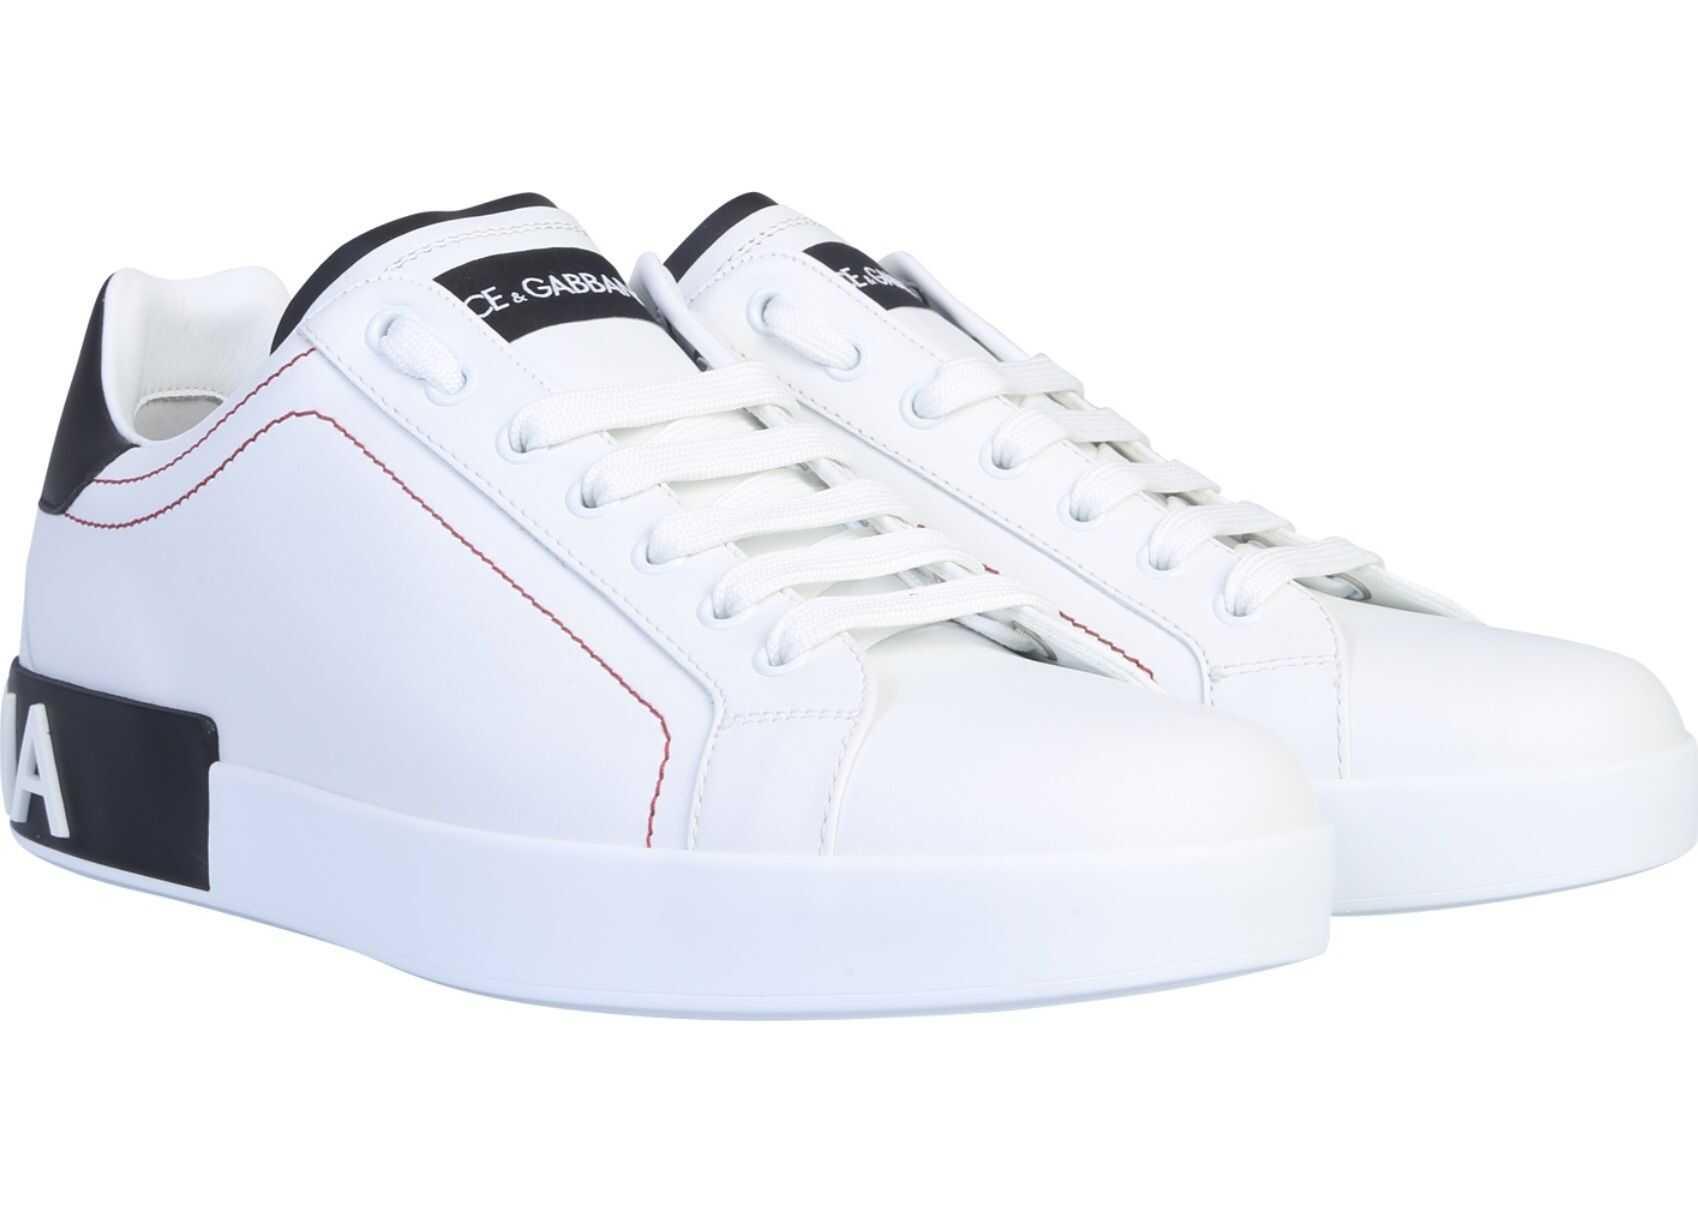 Dolce & Gabbana Portofino Sneakers WHITE